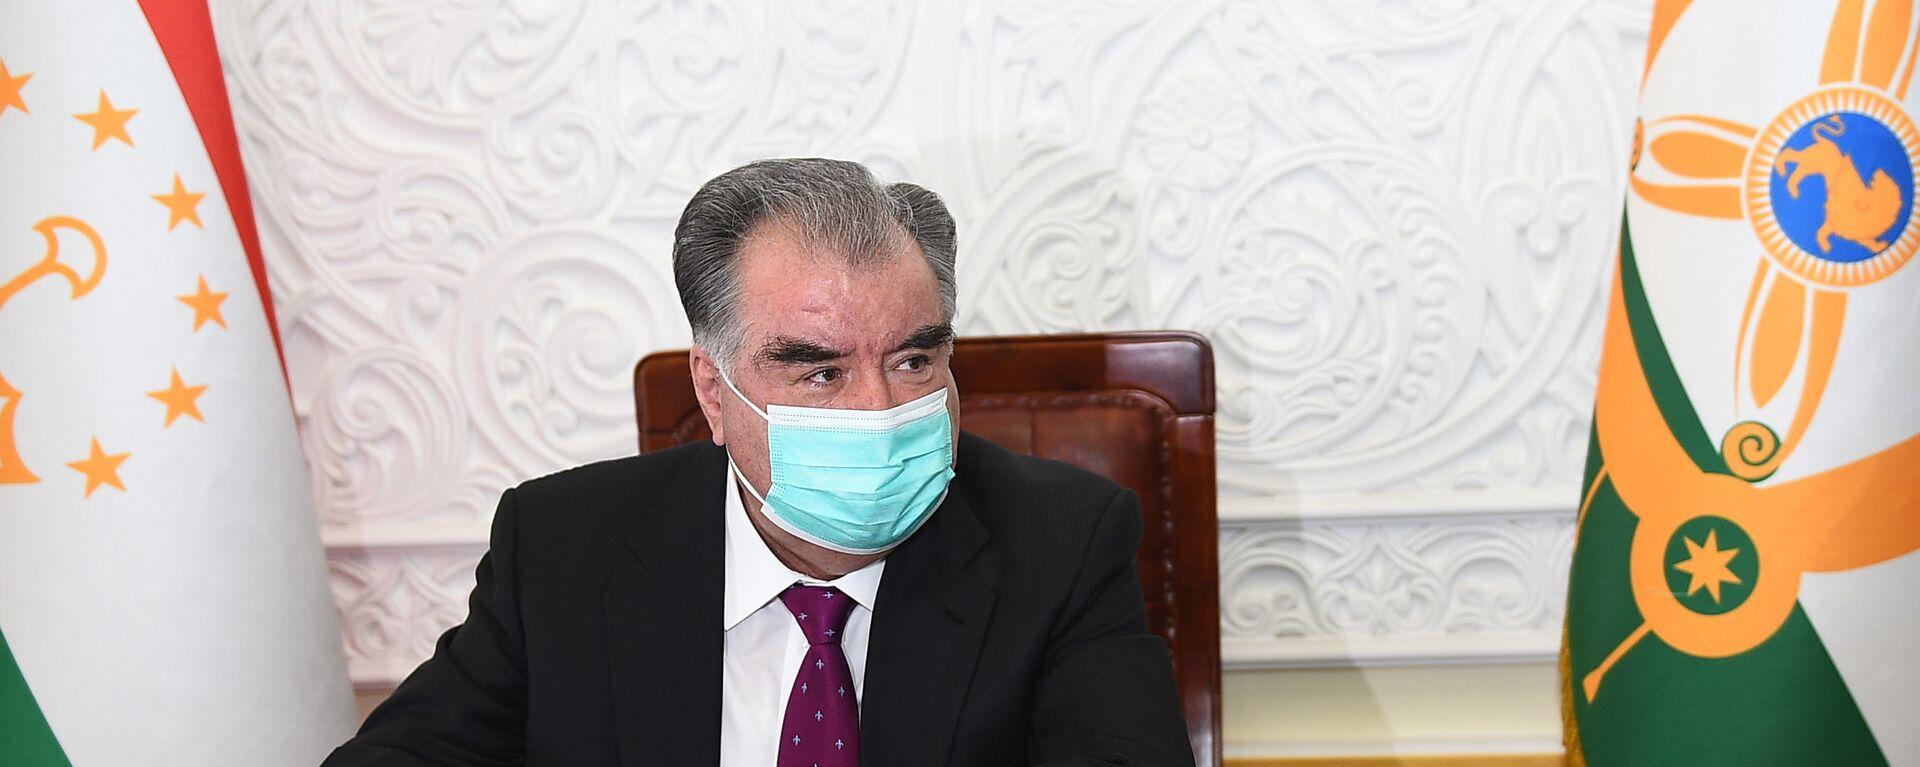 Президент Республики Таджикистан Эмомали Рахмон - Sputnik Тоҷикистон, 1920, 26.04.2021